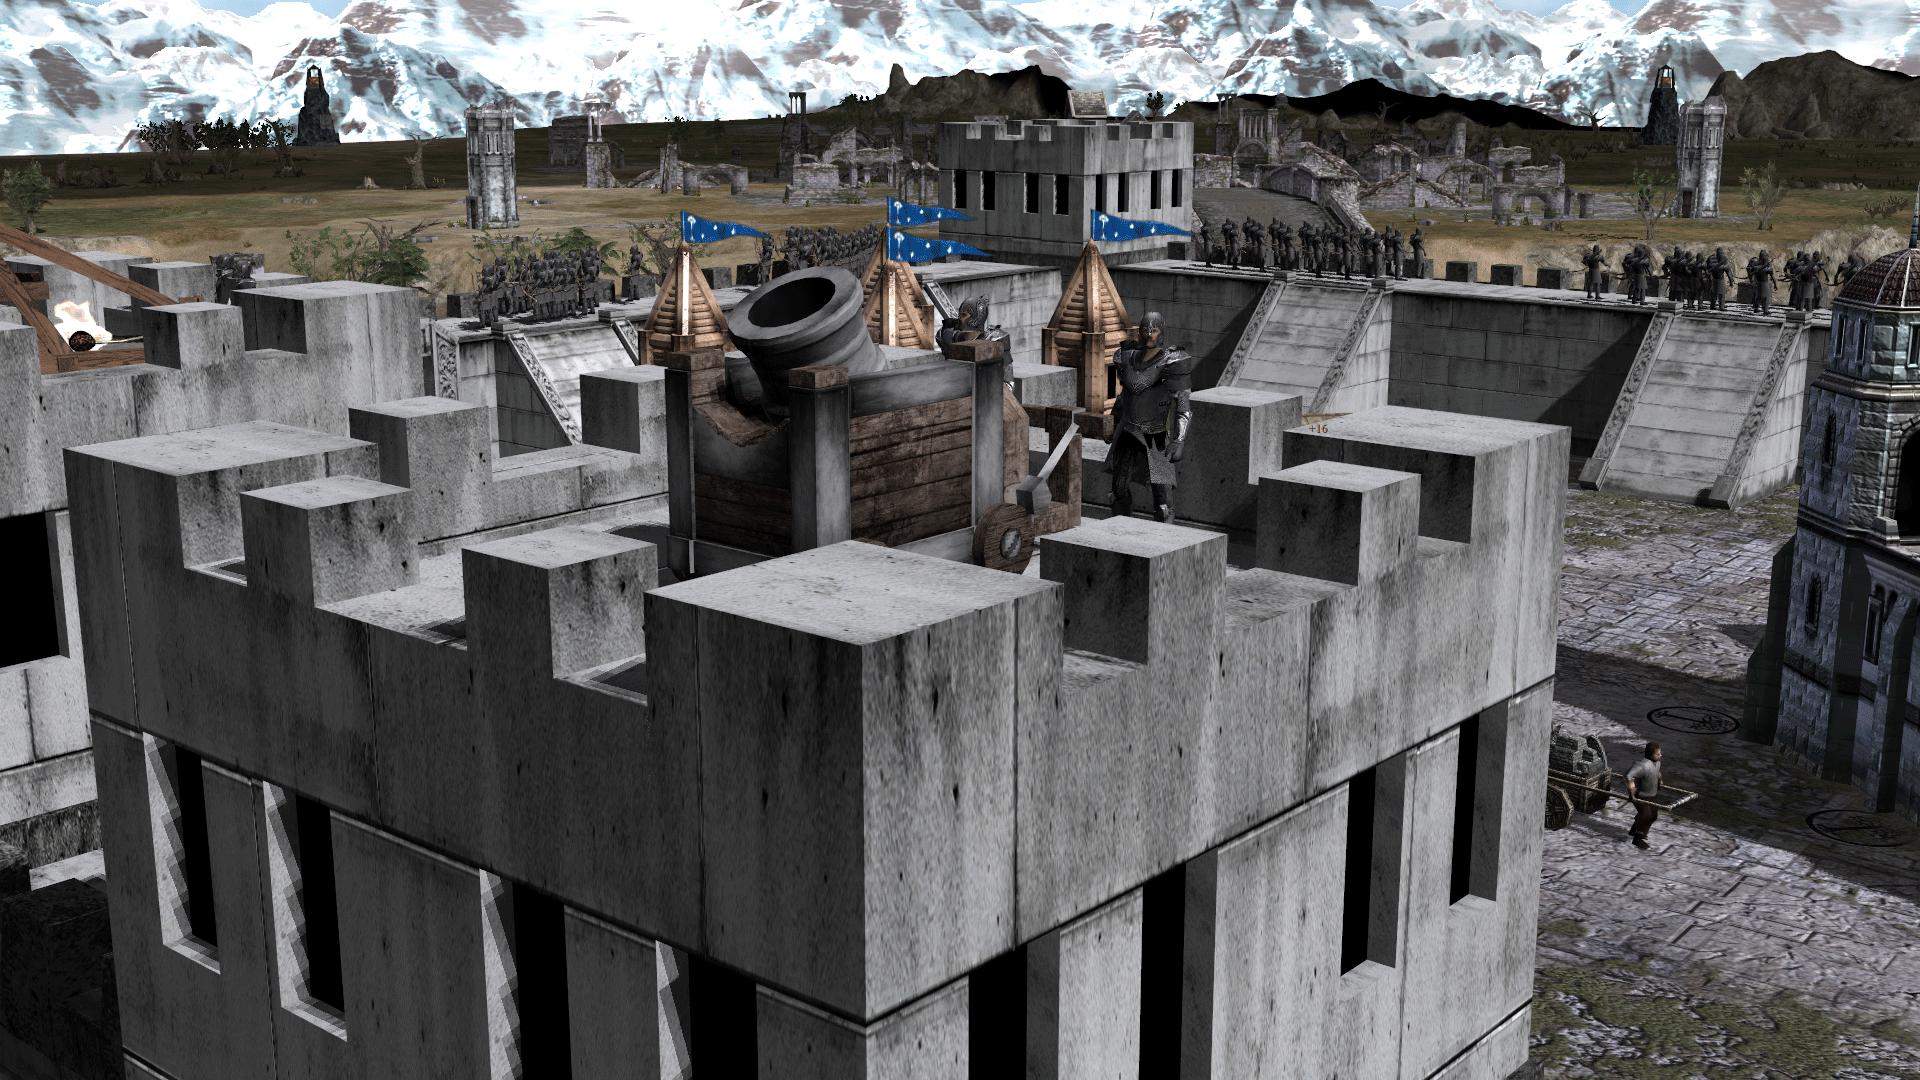 ck2 how to build castle